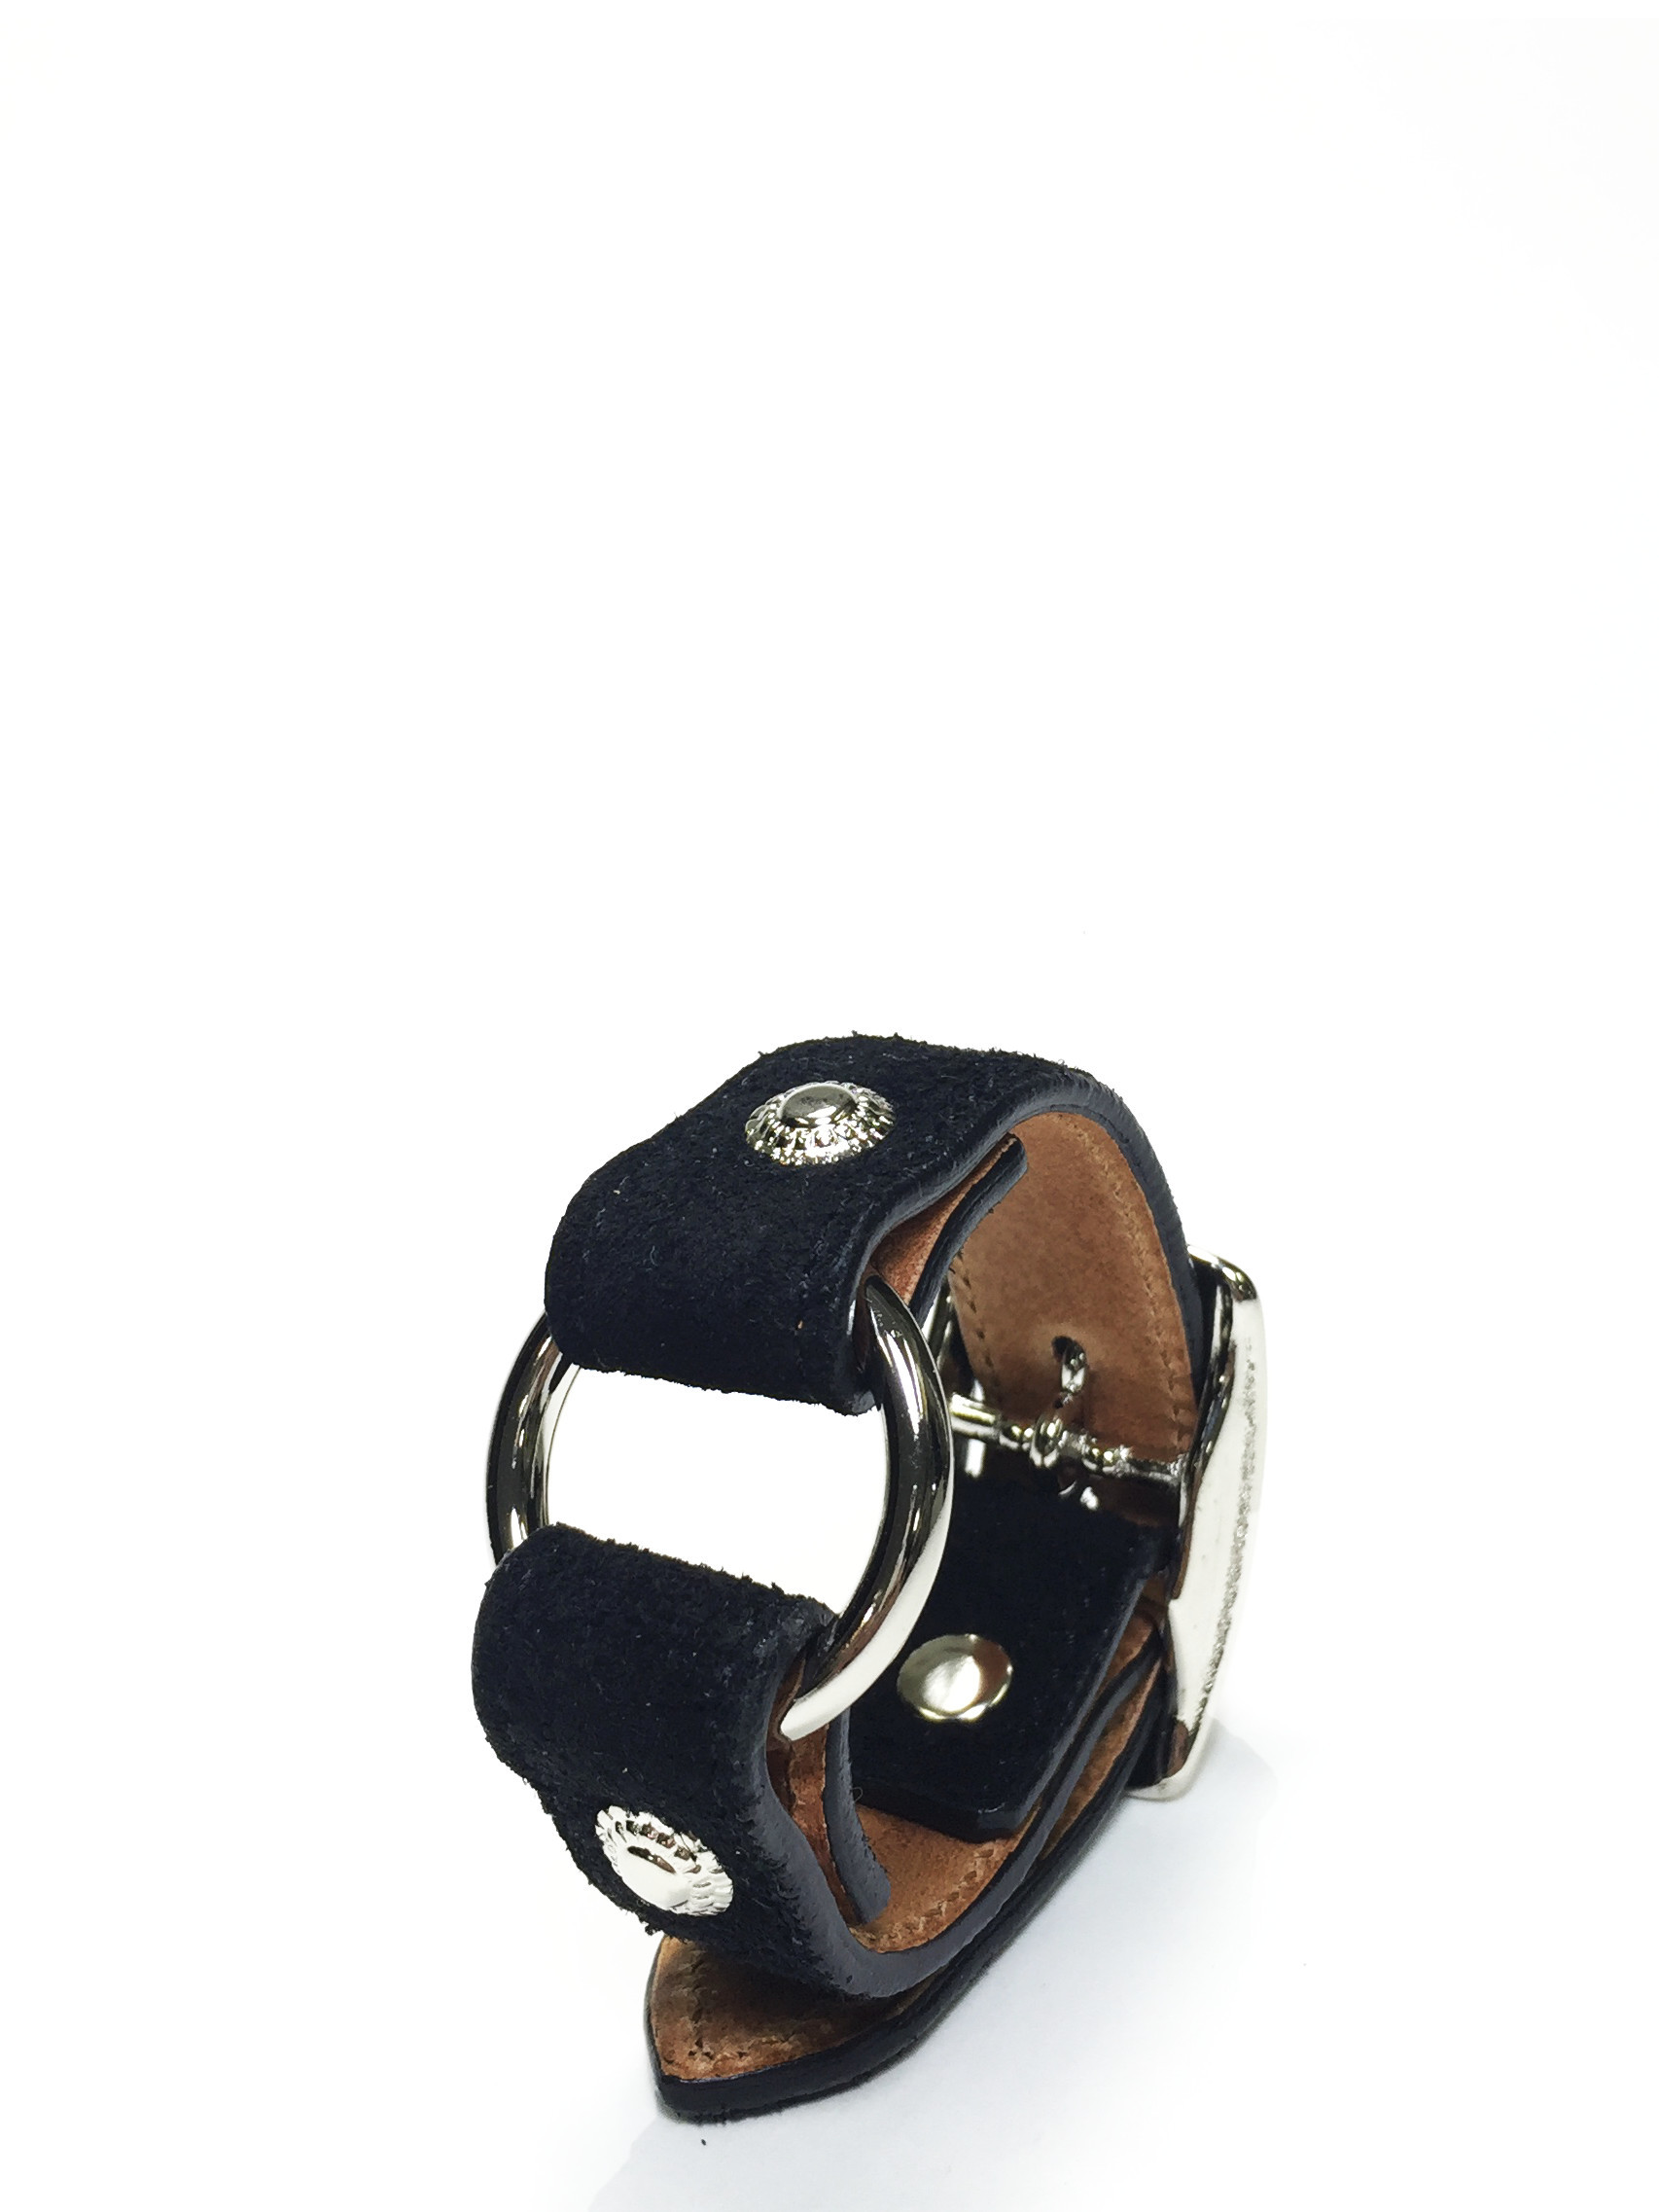 nahezugleich / Suede Ring bracelet - 画像2